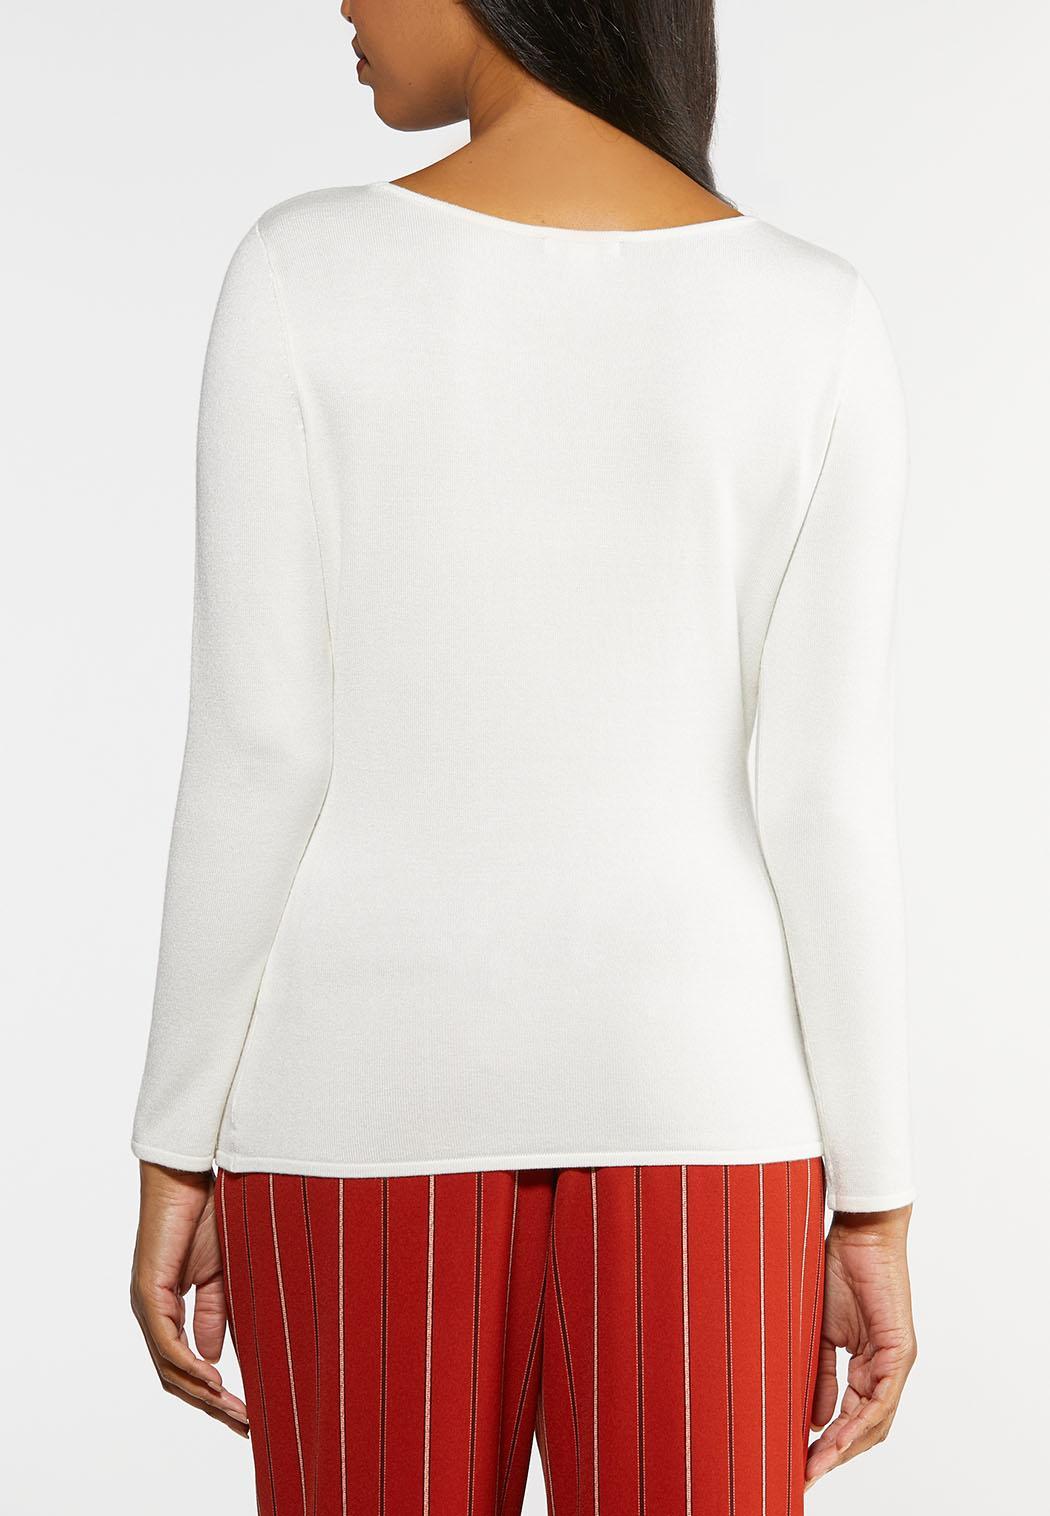 Plus Size Solid Crew Neck Sweater (Item #43961047)